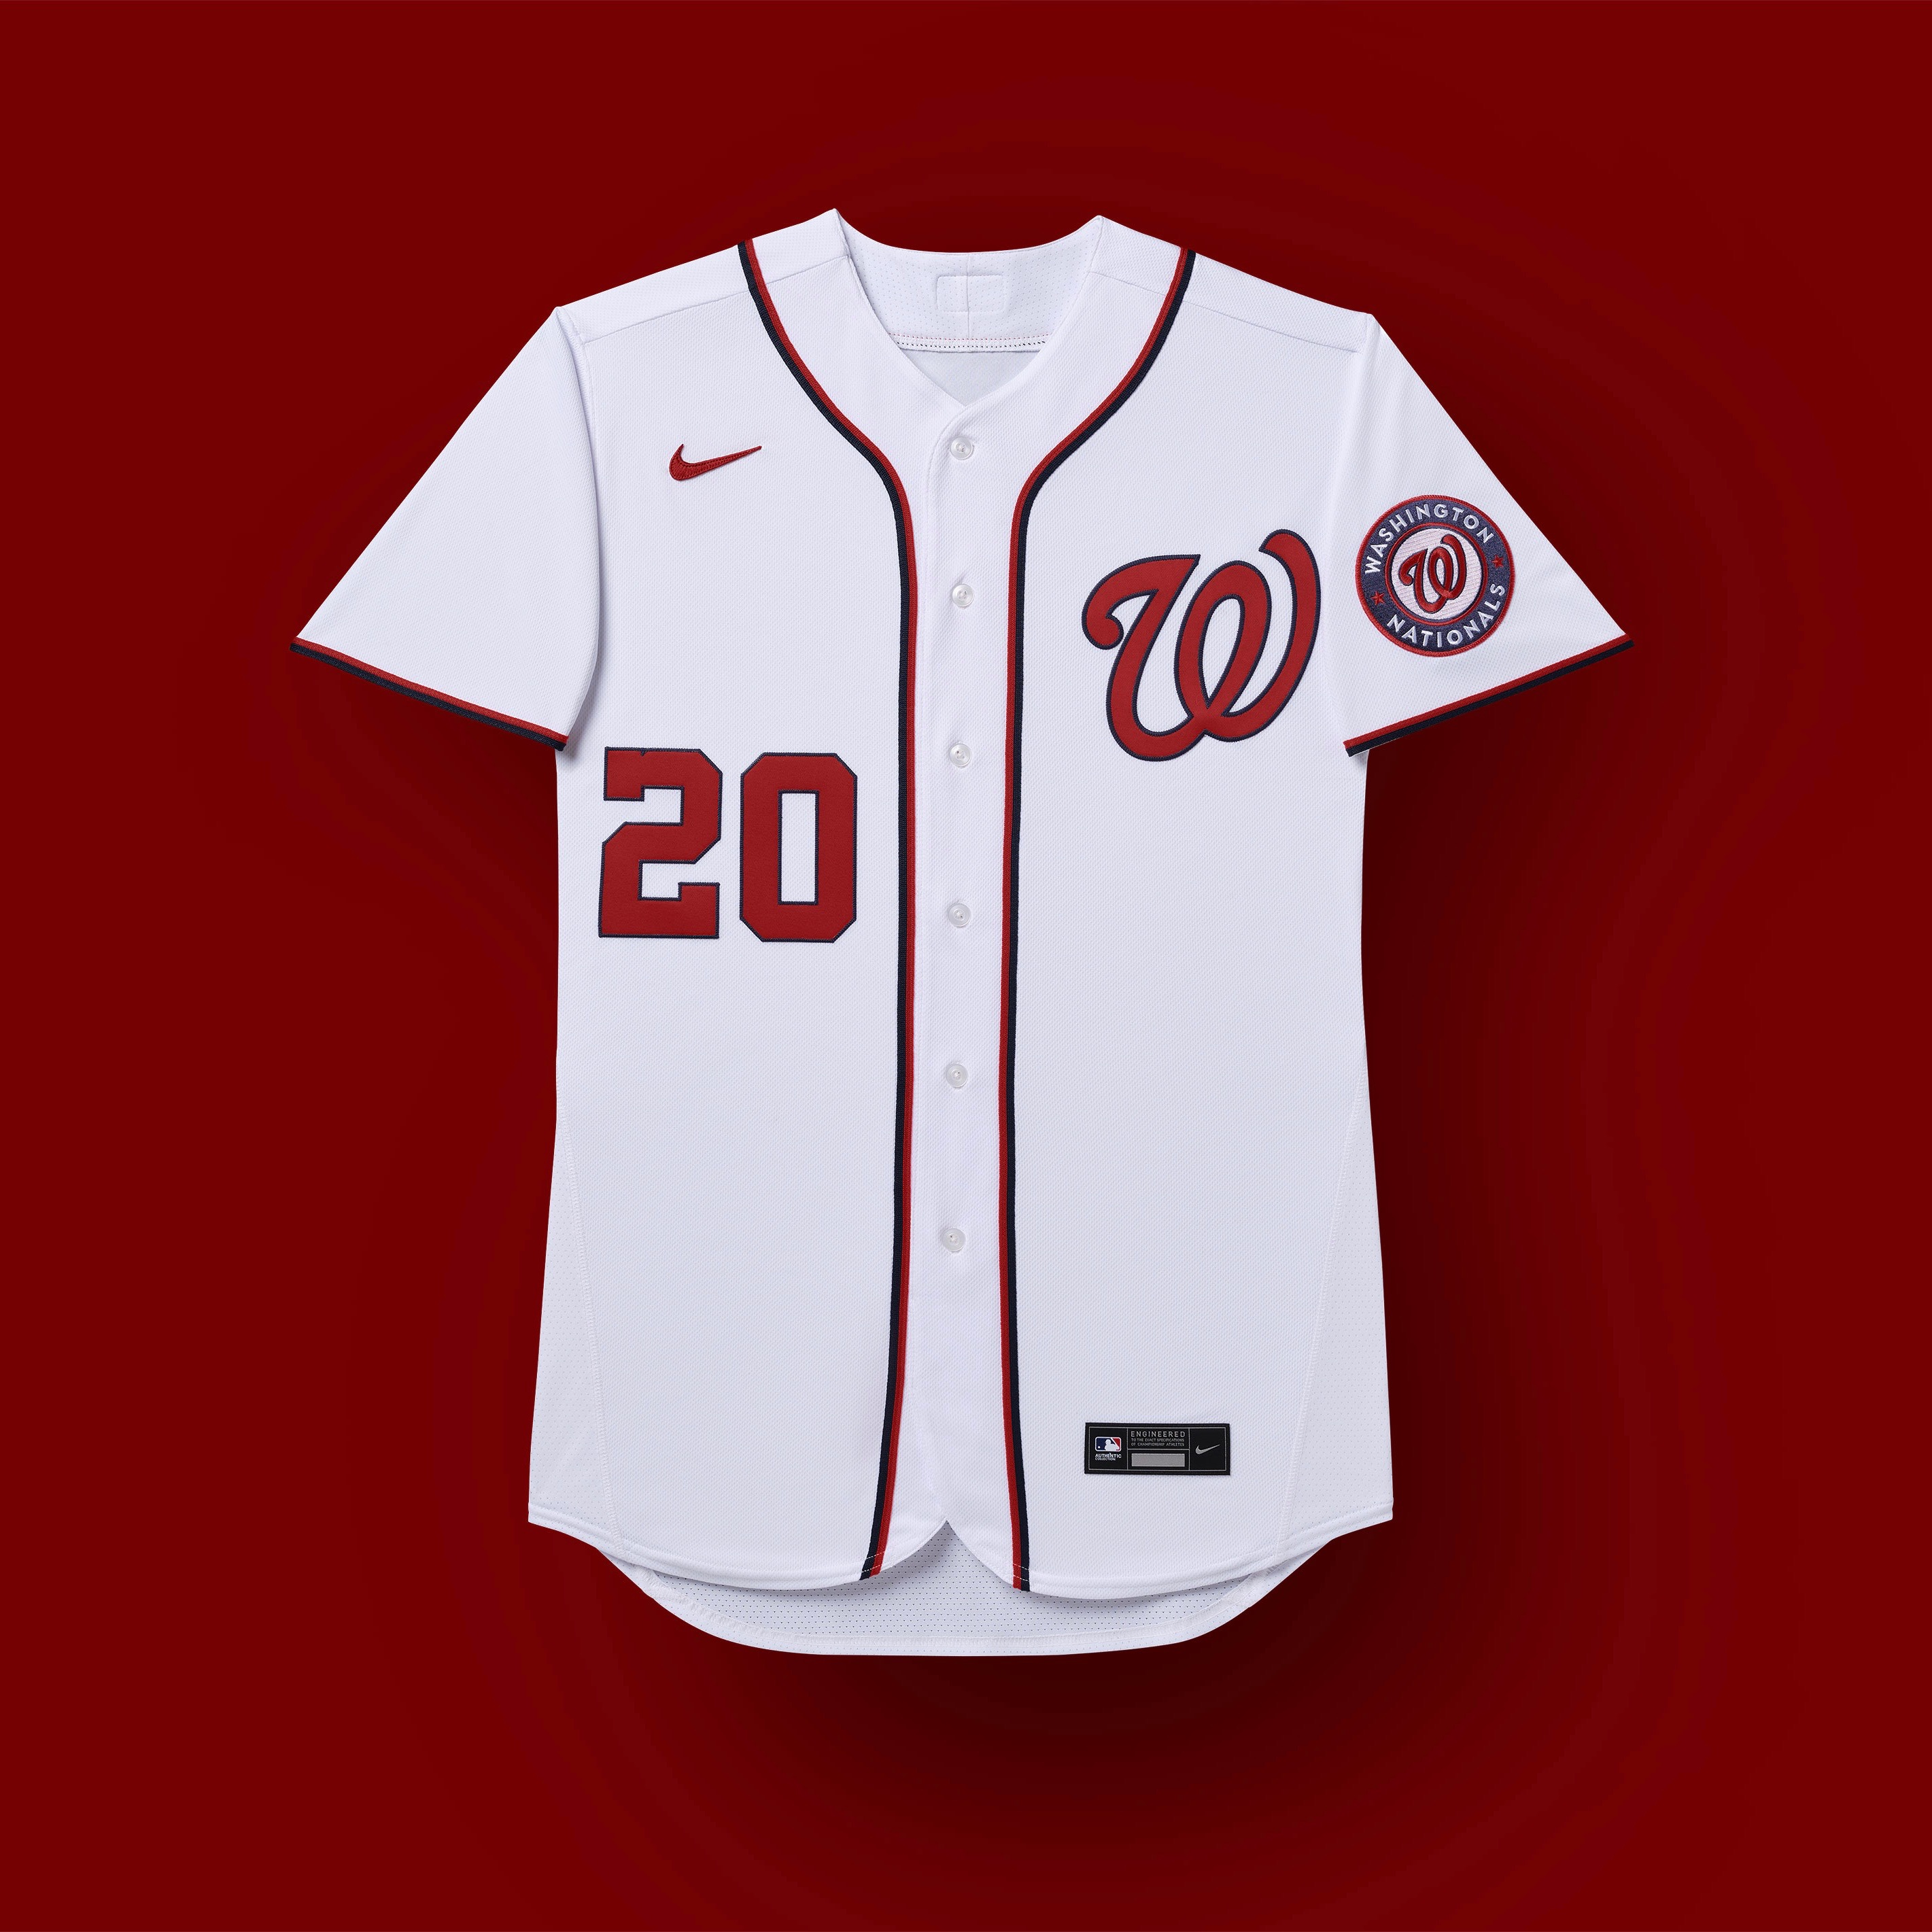 washington nationals 2020 uniforms